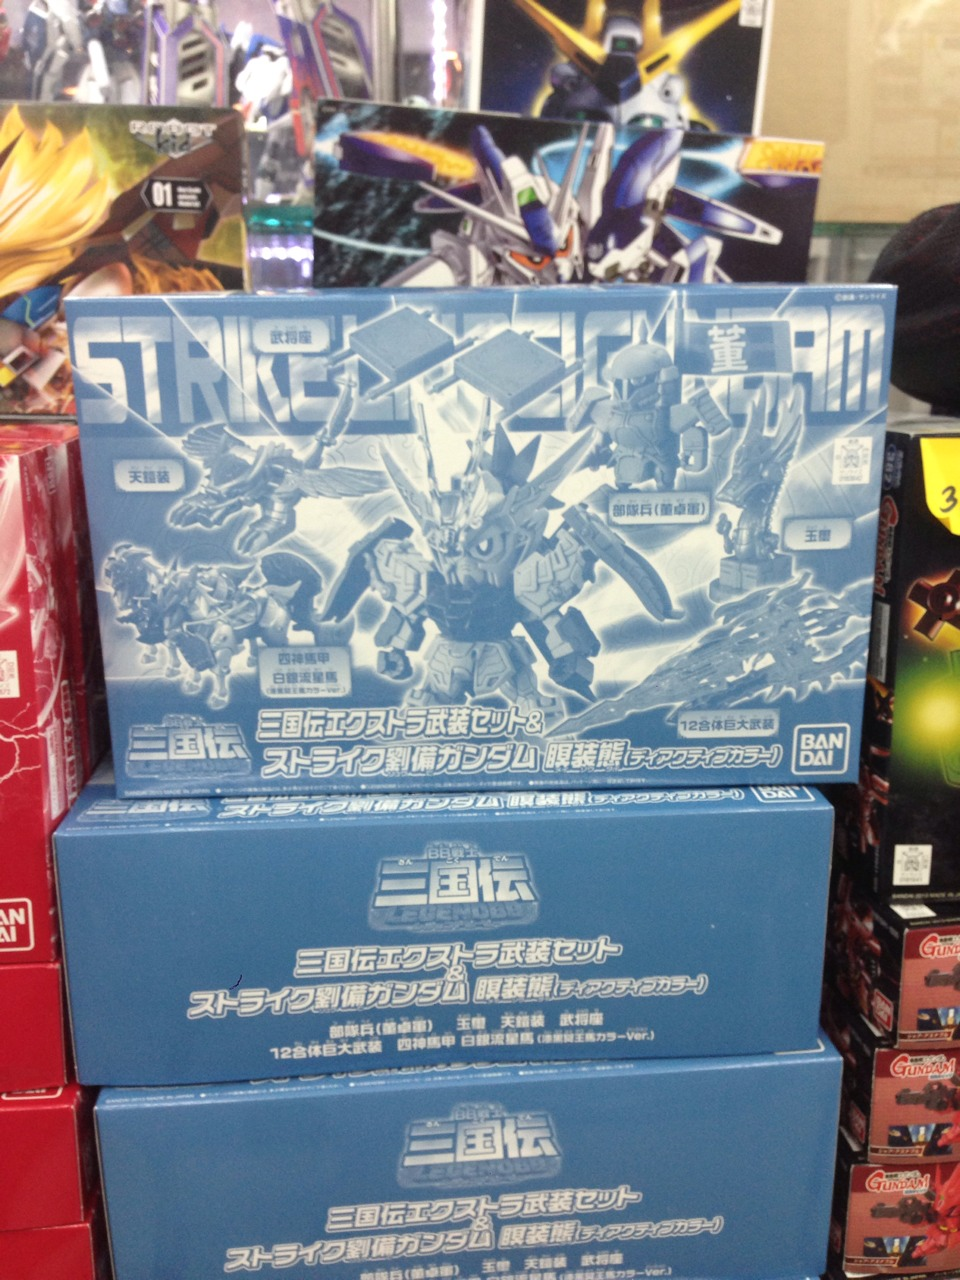 Sd Strike Ryubi Gundam ( Premium Bandai Limited.Ver )